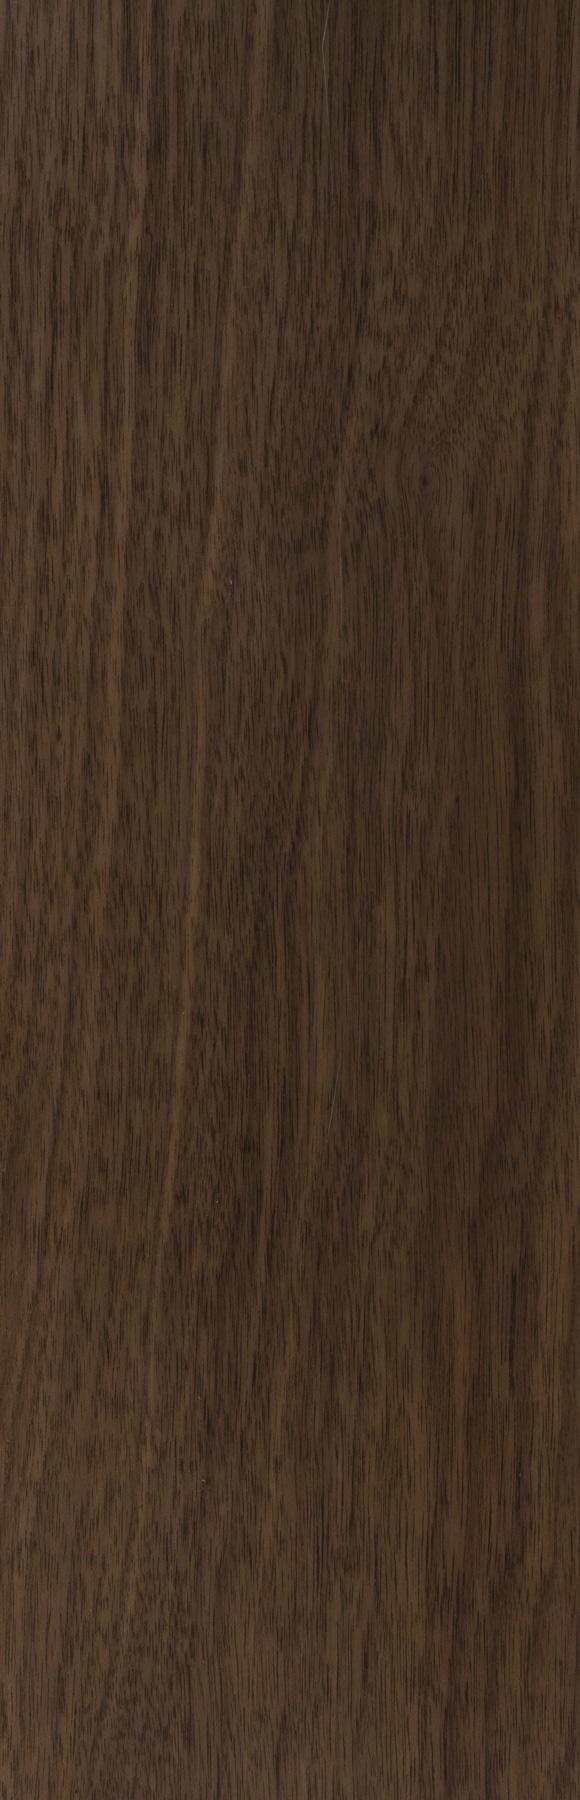 maderas-terramont-loft-life-american-walnut